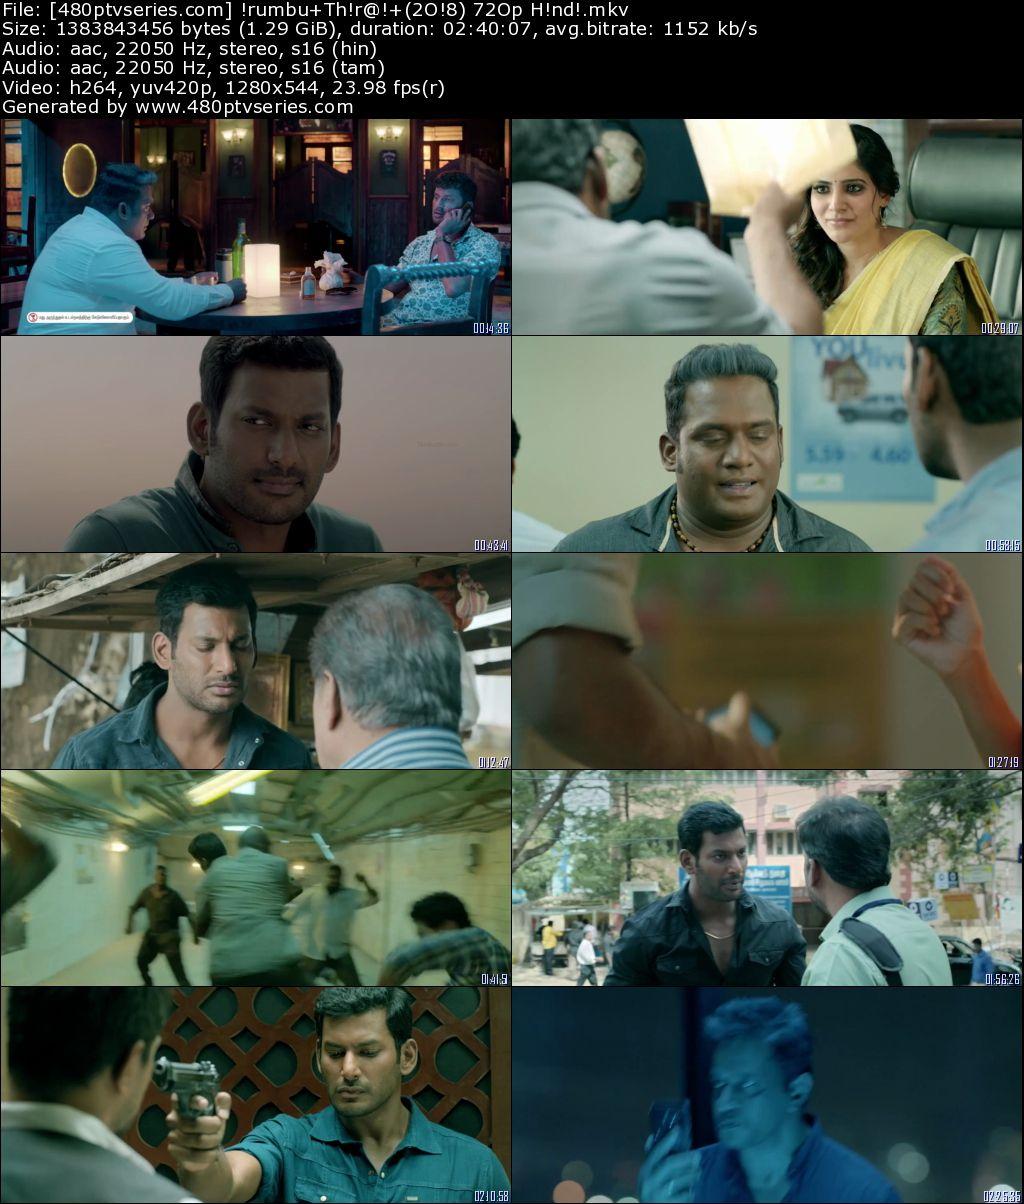 Download Irumbu Thirai (2018) Full Hindi Dual Audio Movie Download 720p HDRip Free Watch Online Full Movie Download Worldfree4u 9xmovies